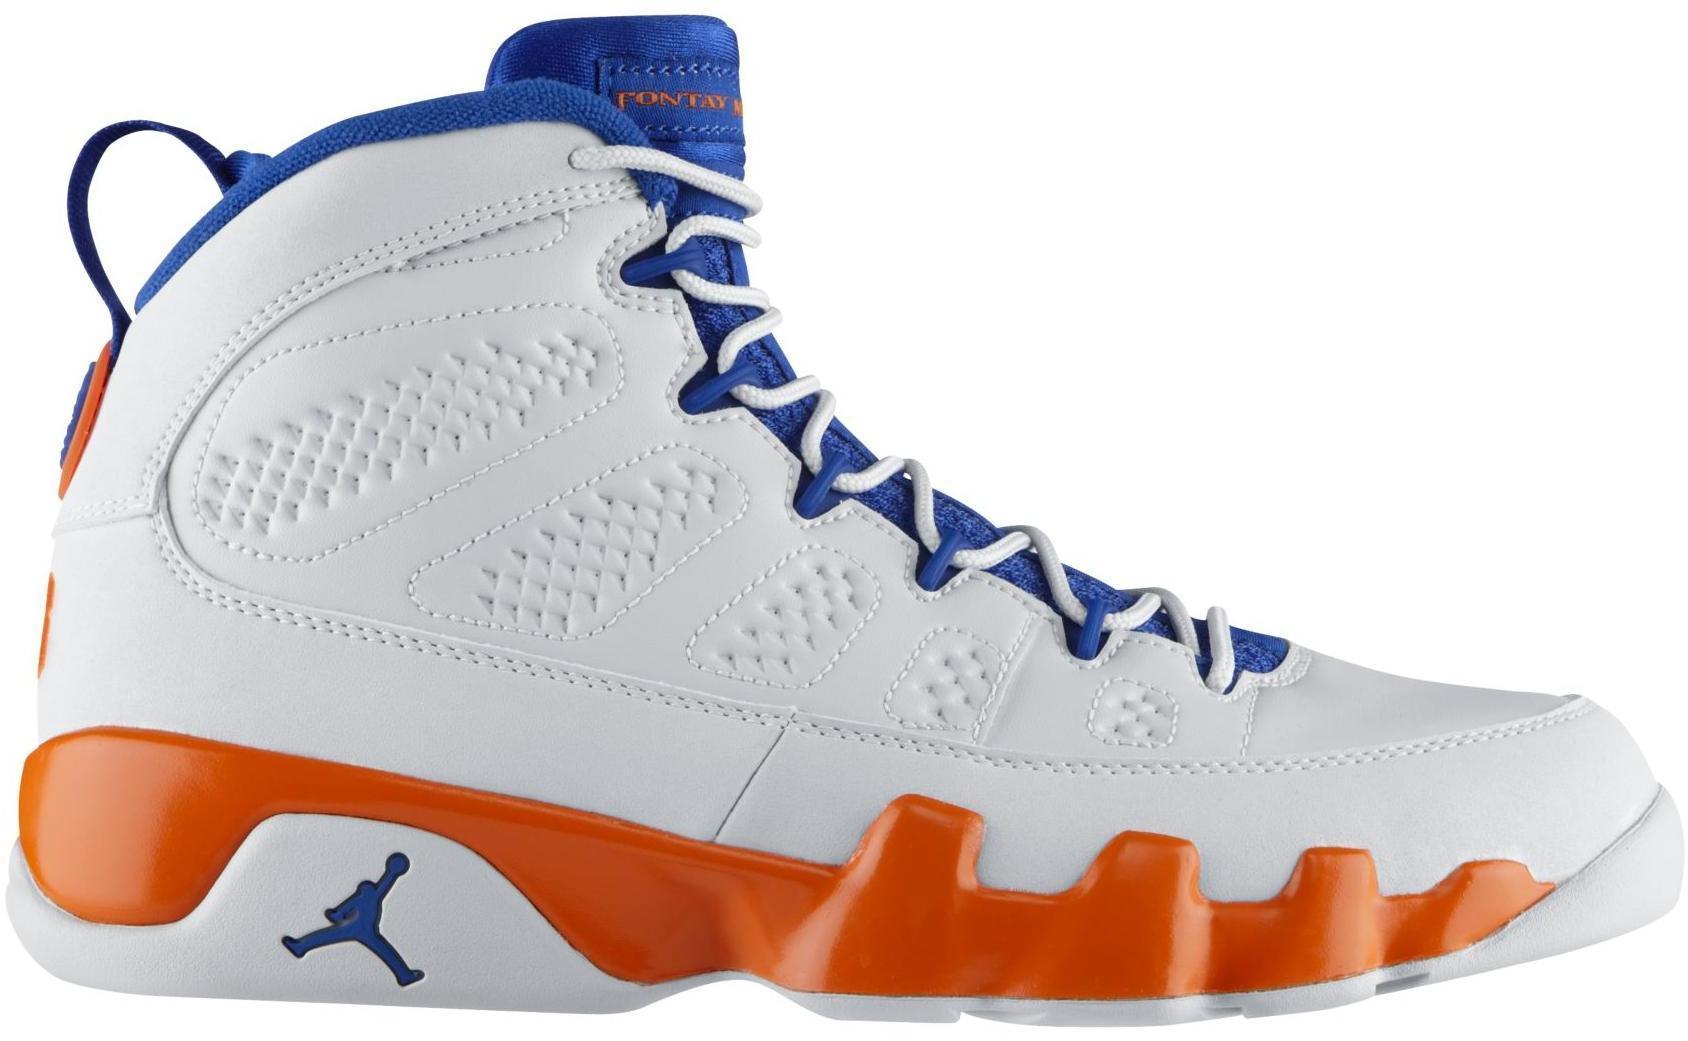 Lyst - Nike 9 Retro Fontay Montana (knicks) in Blue for Men b806d0315ac5